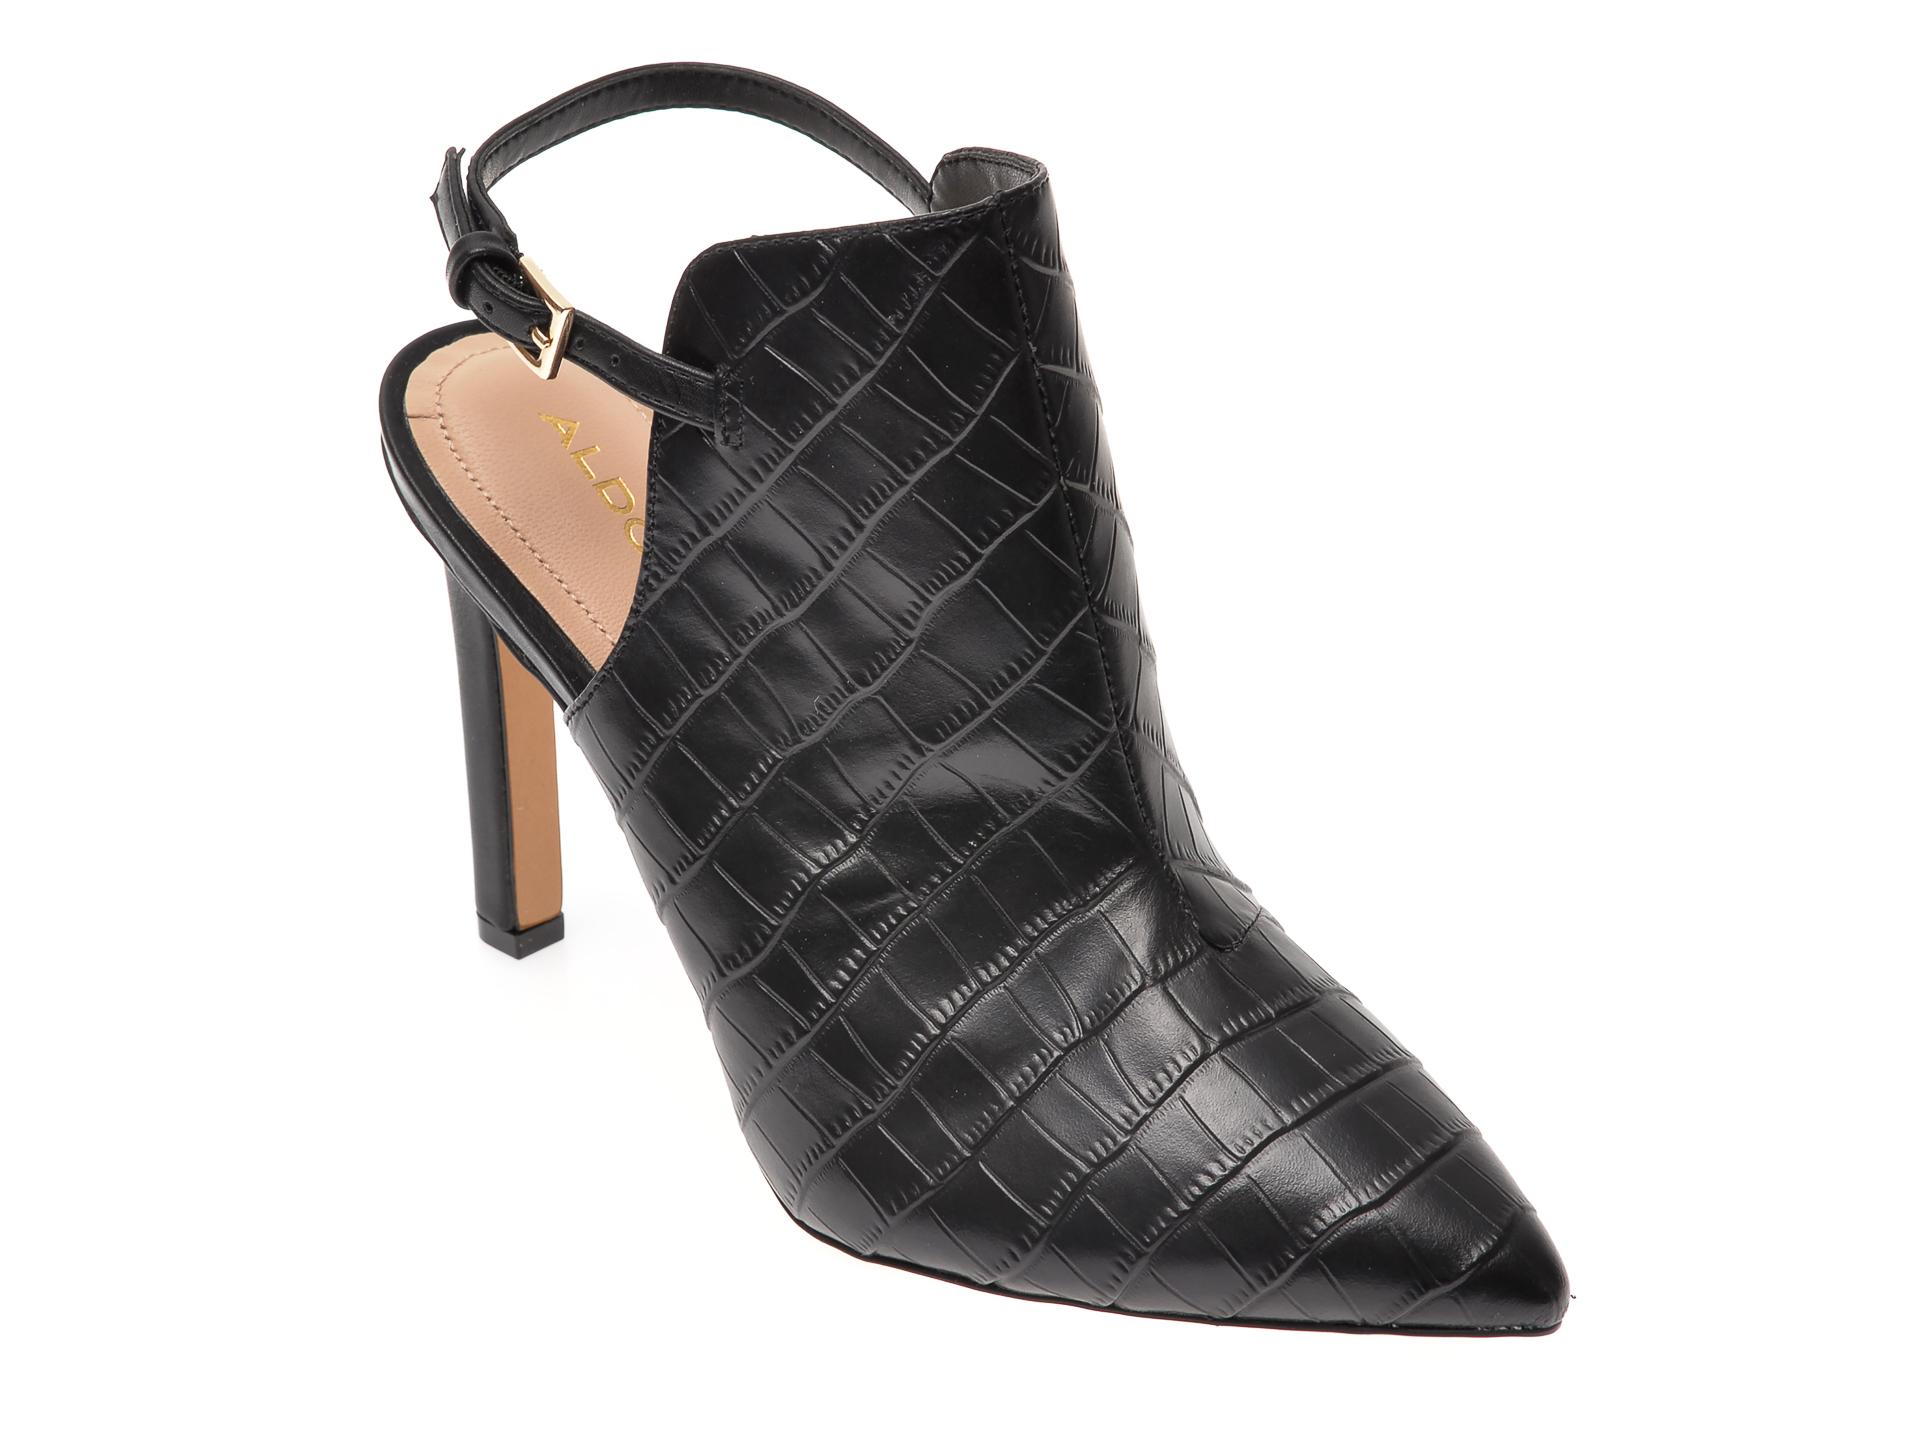 Pantofi ALDO negri, Firleigh007, din piele naturala imagine otter.ro 2021